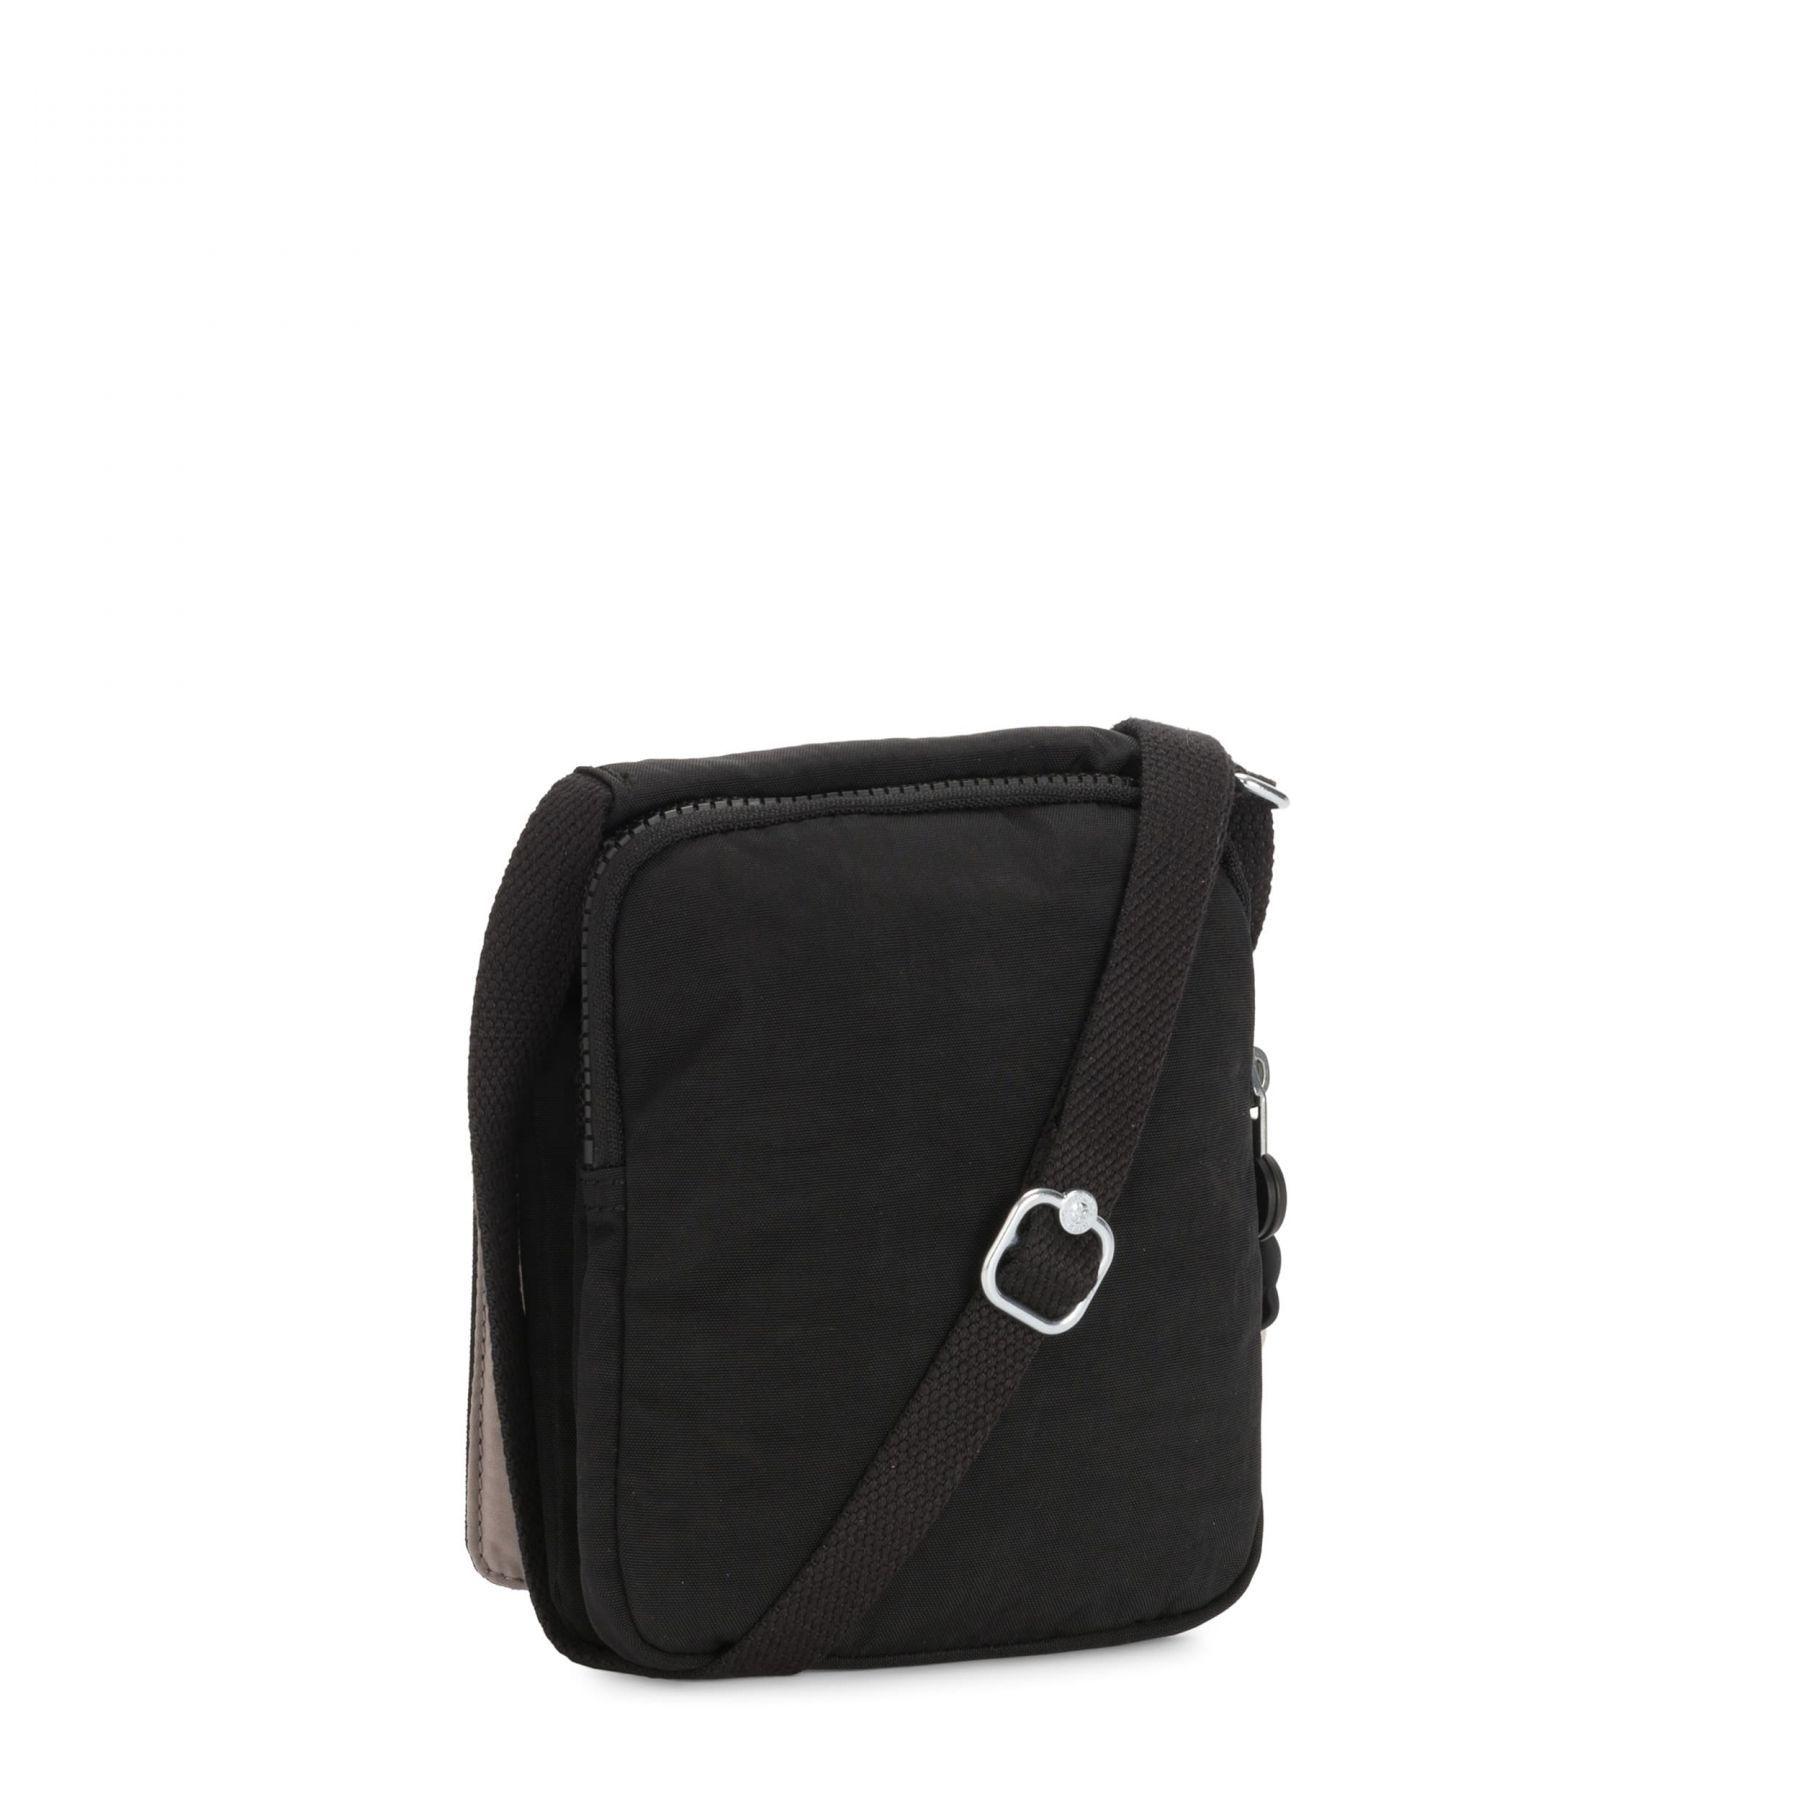 Bolsa Pequena Kipling New Eldorado Black Noir